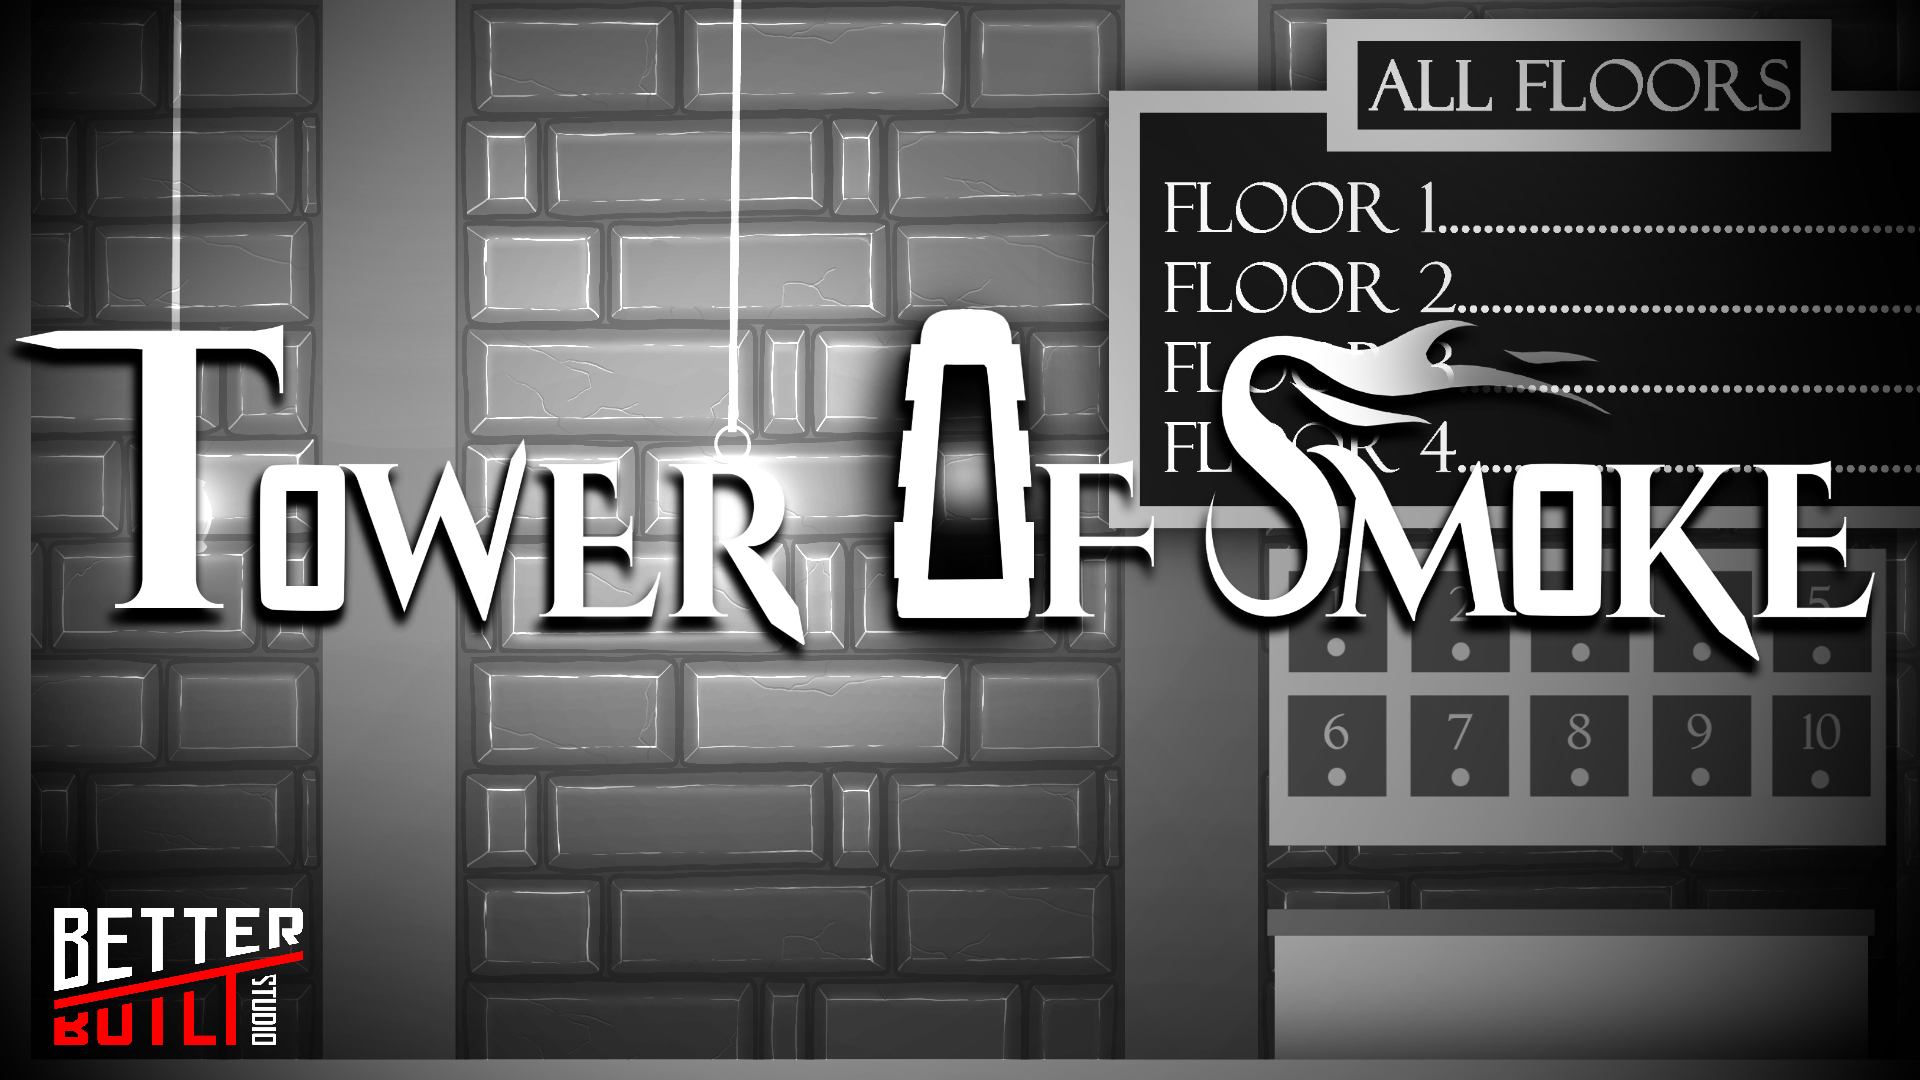 Tower of Smoke